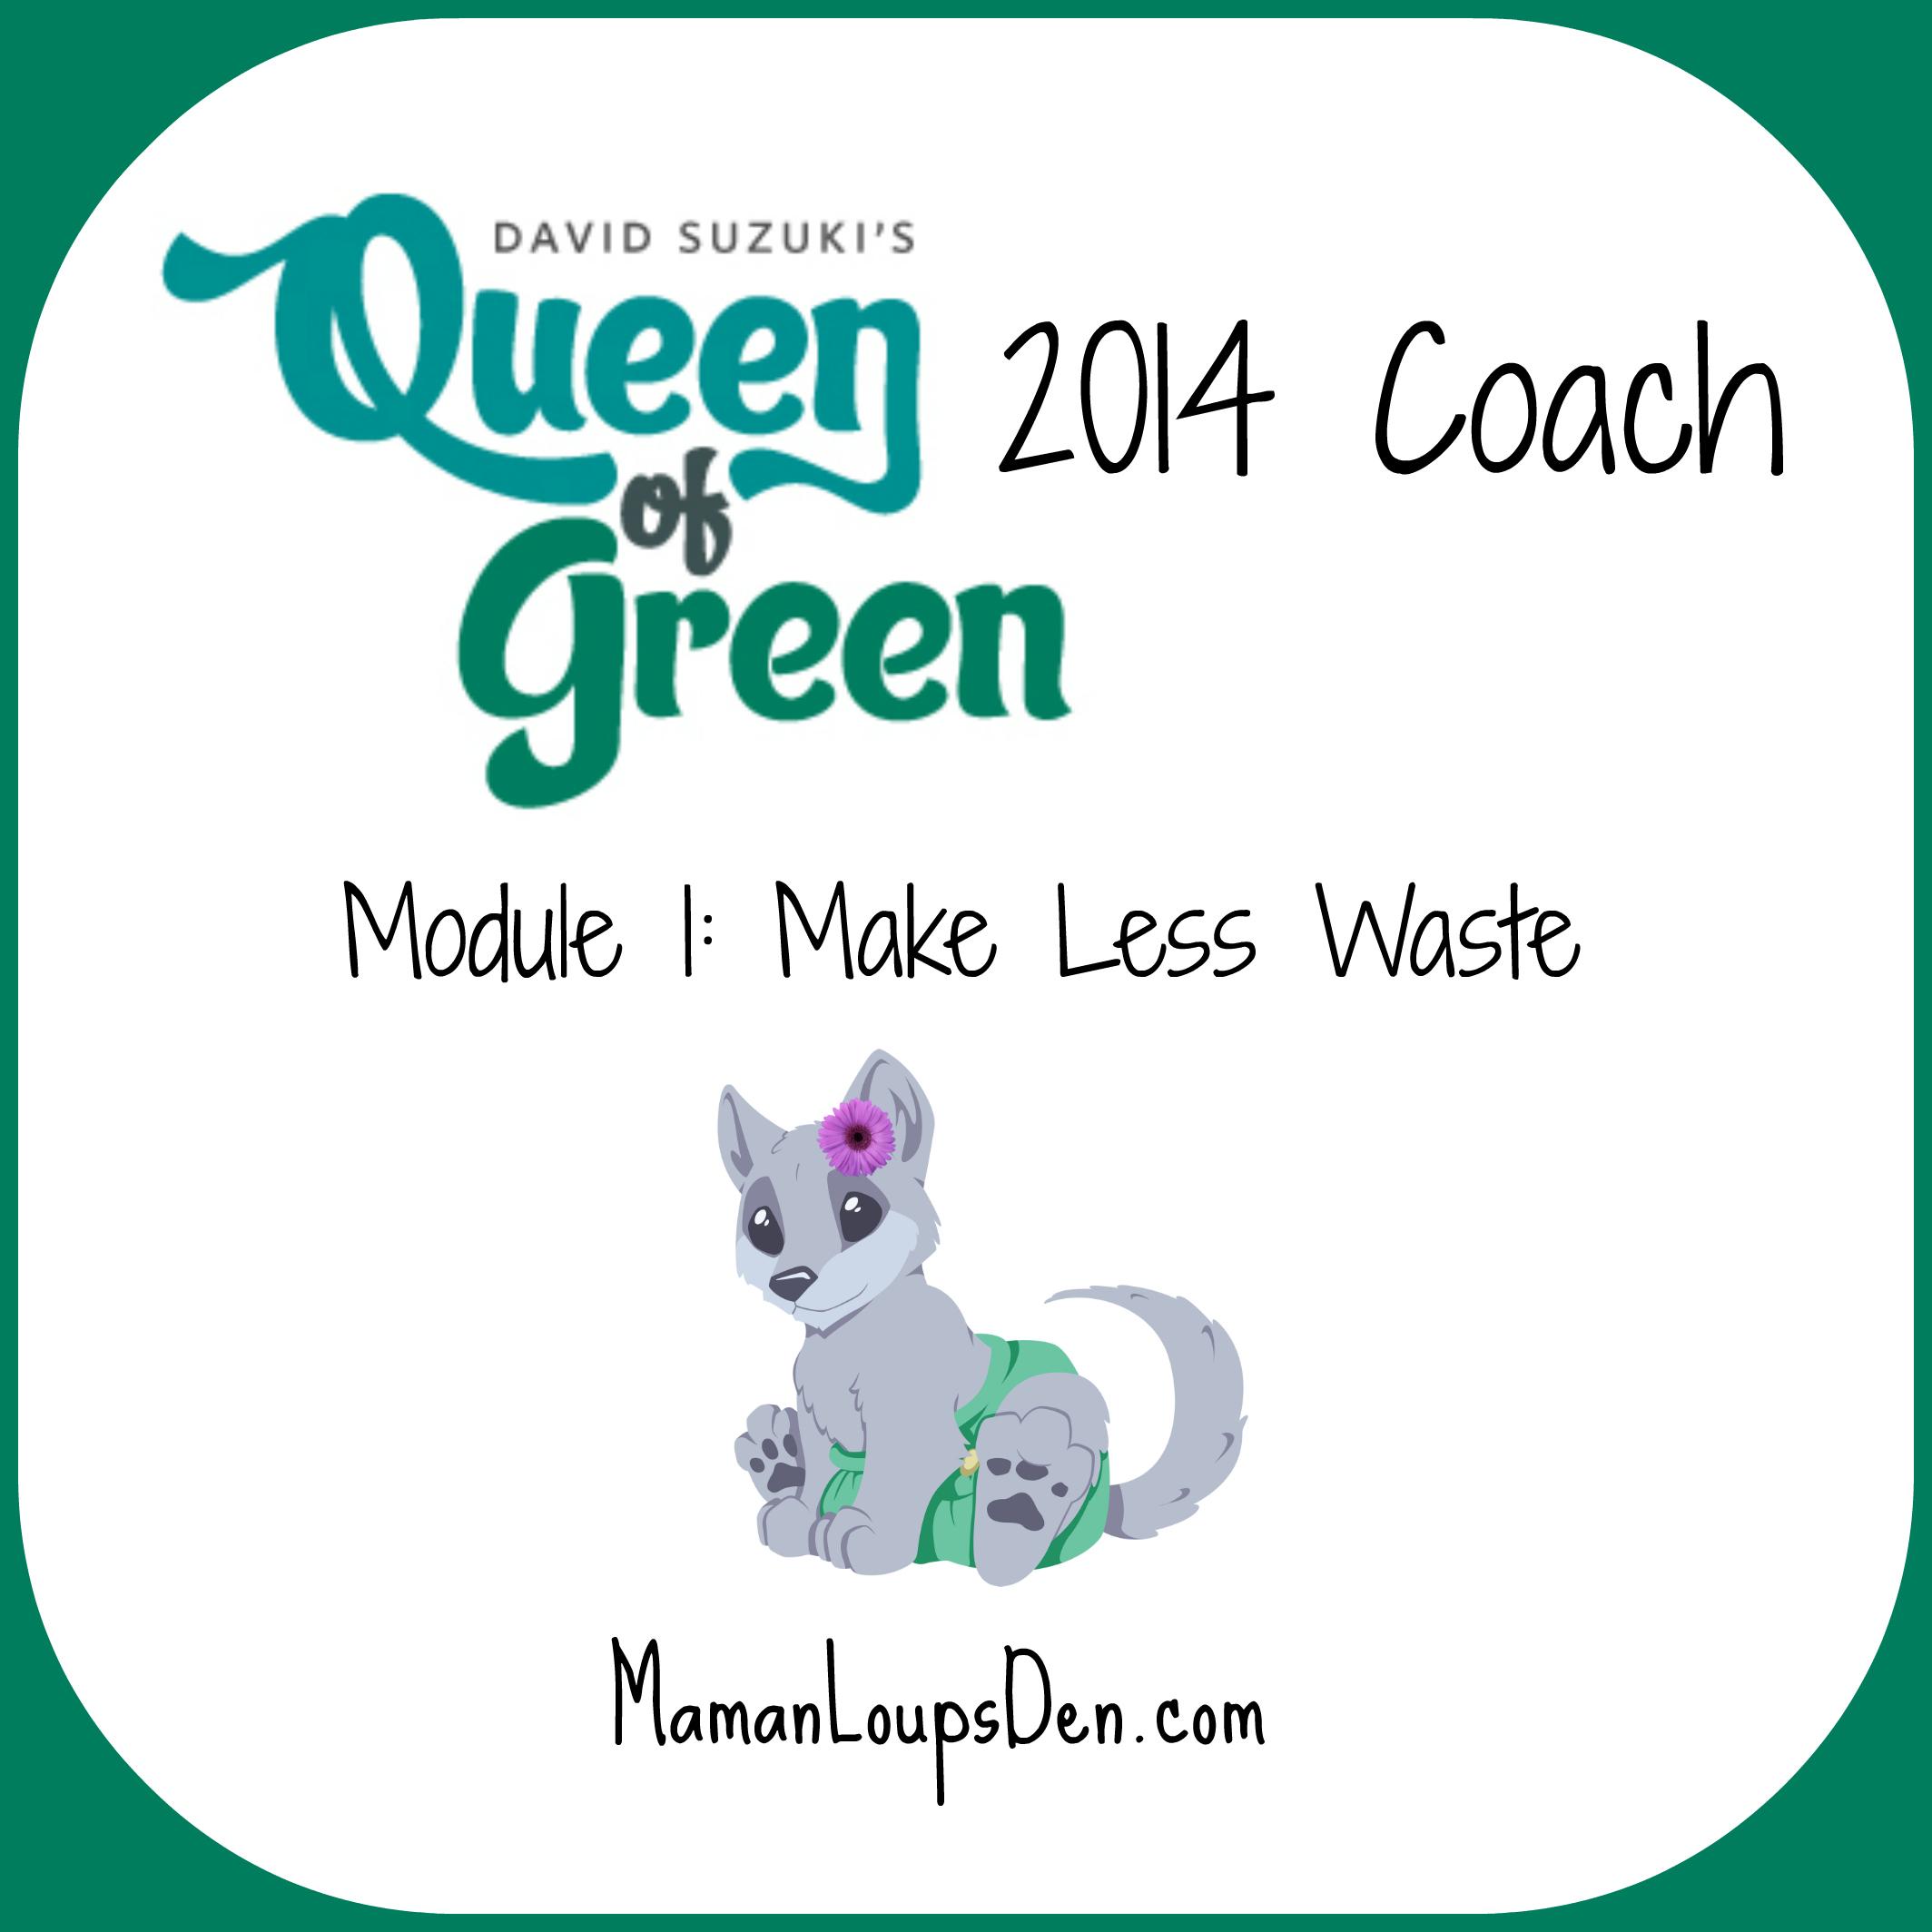 Queen of Green Coaching Module 1: Make Less Waste